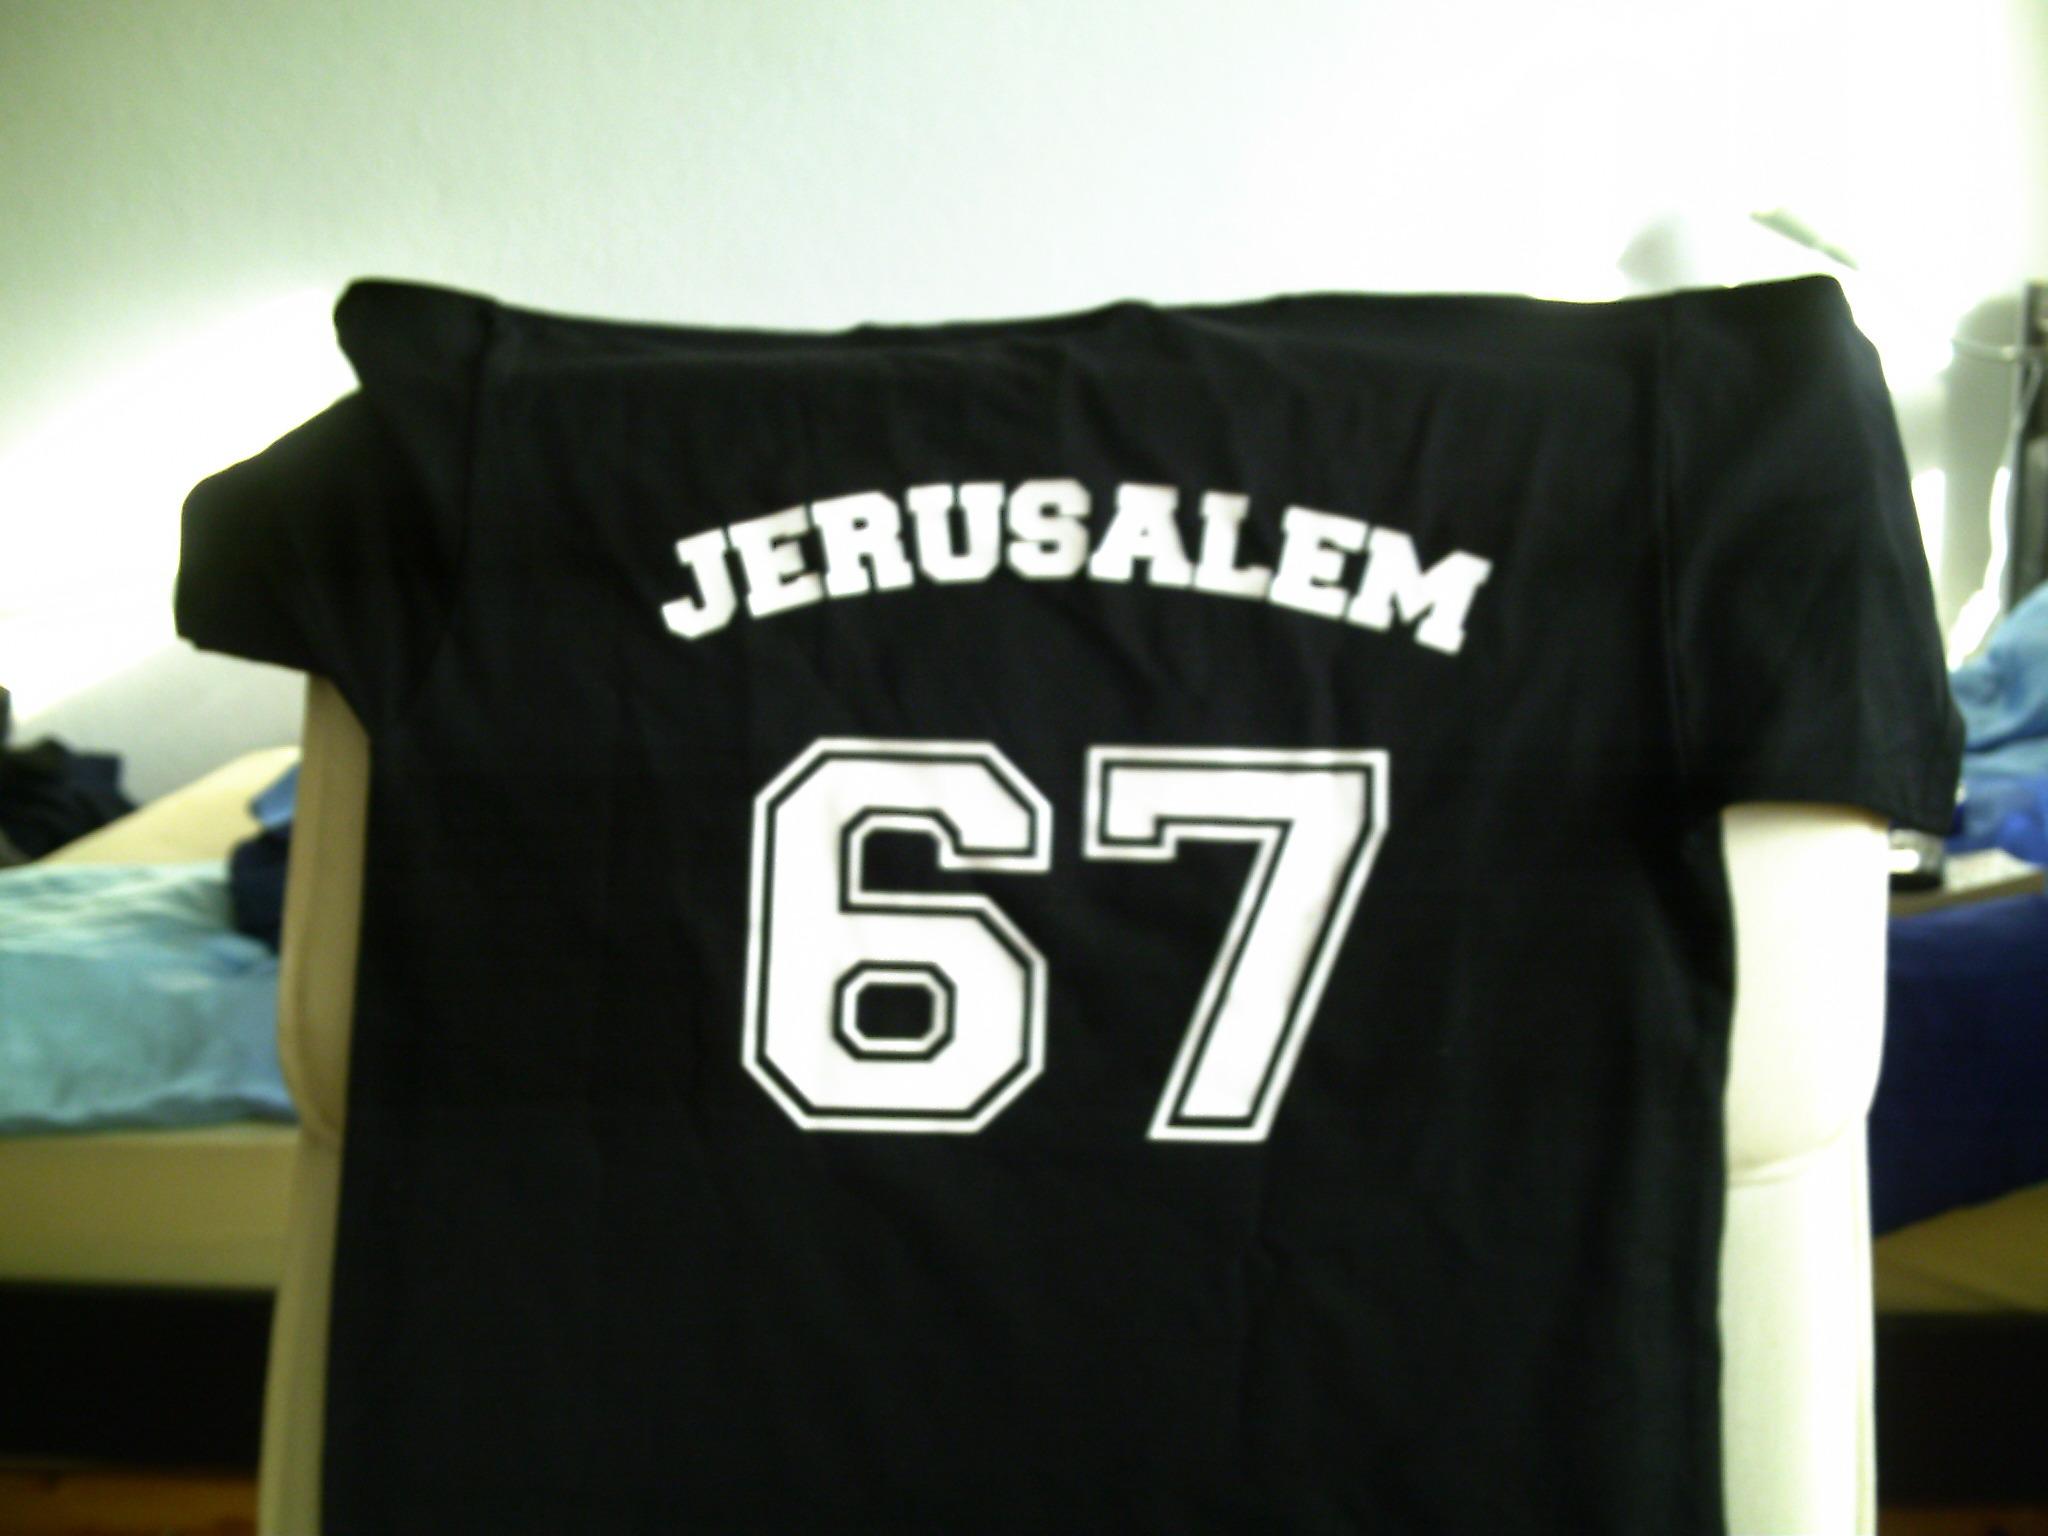 jerusalem 67